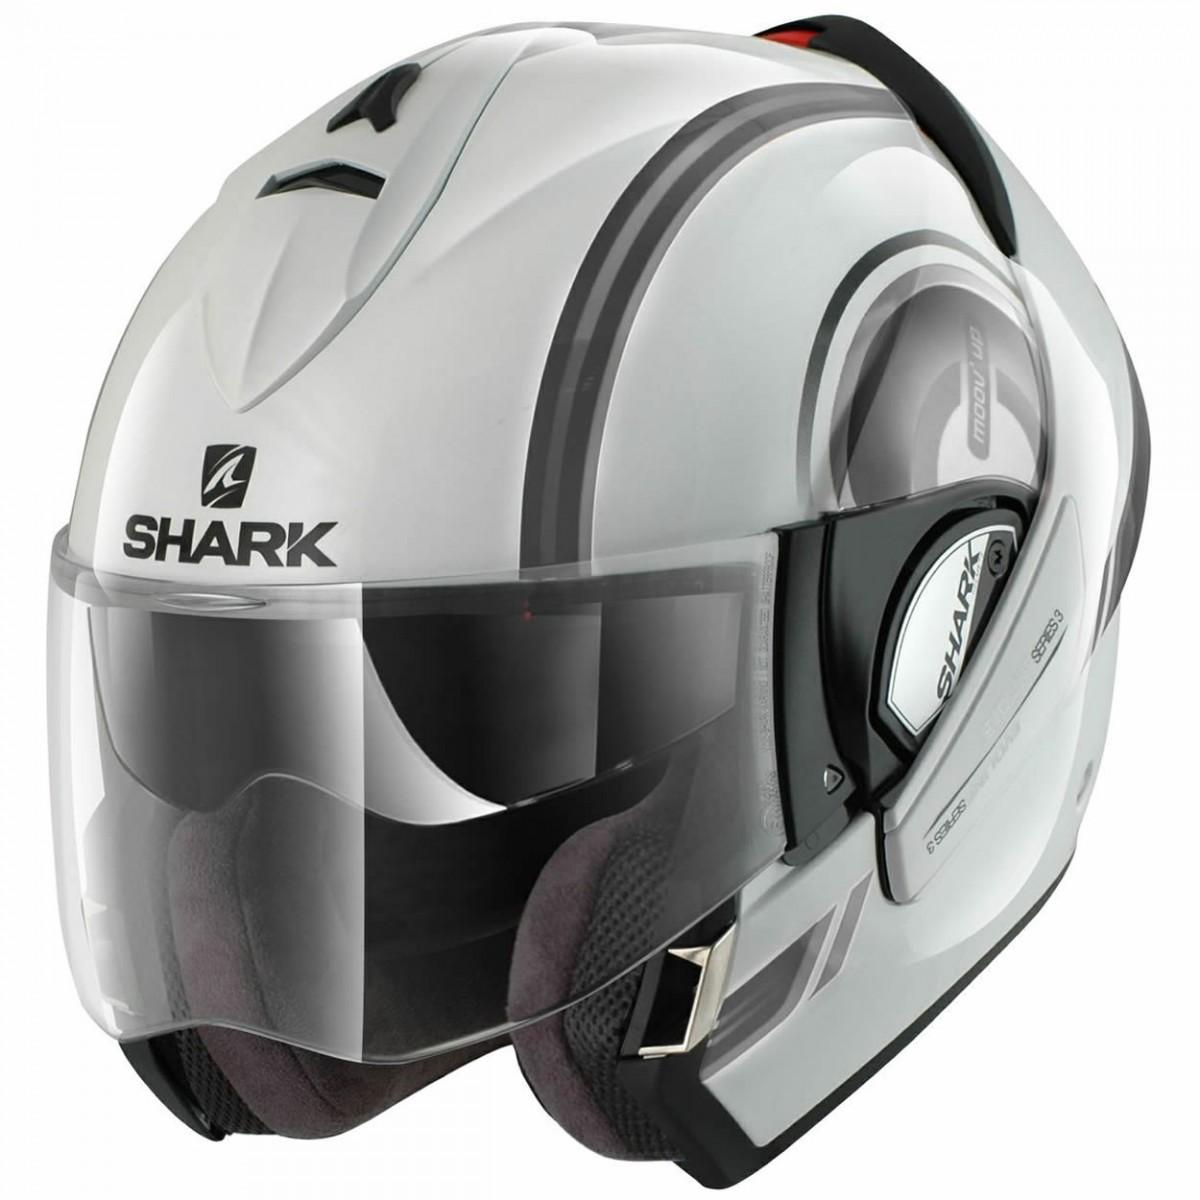 Capacete Shark Evoline Serie 3 Moov Up WKS  - Super Bike - Loja Oficial Alpinestars